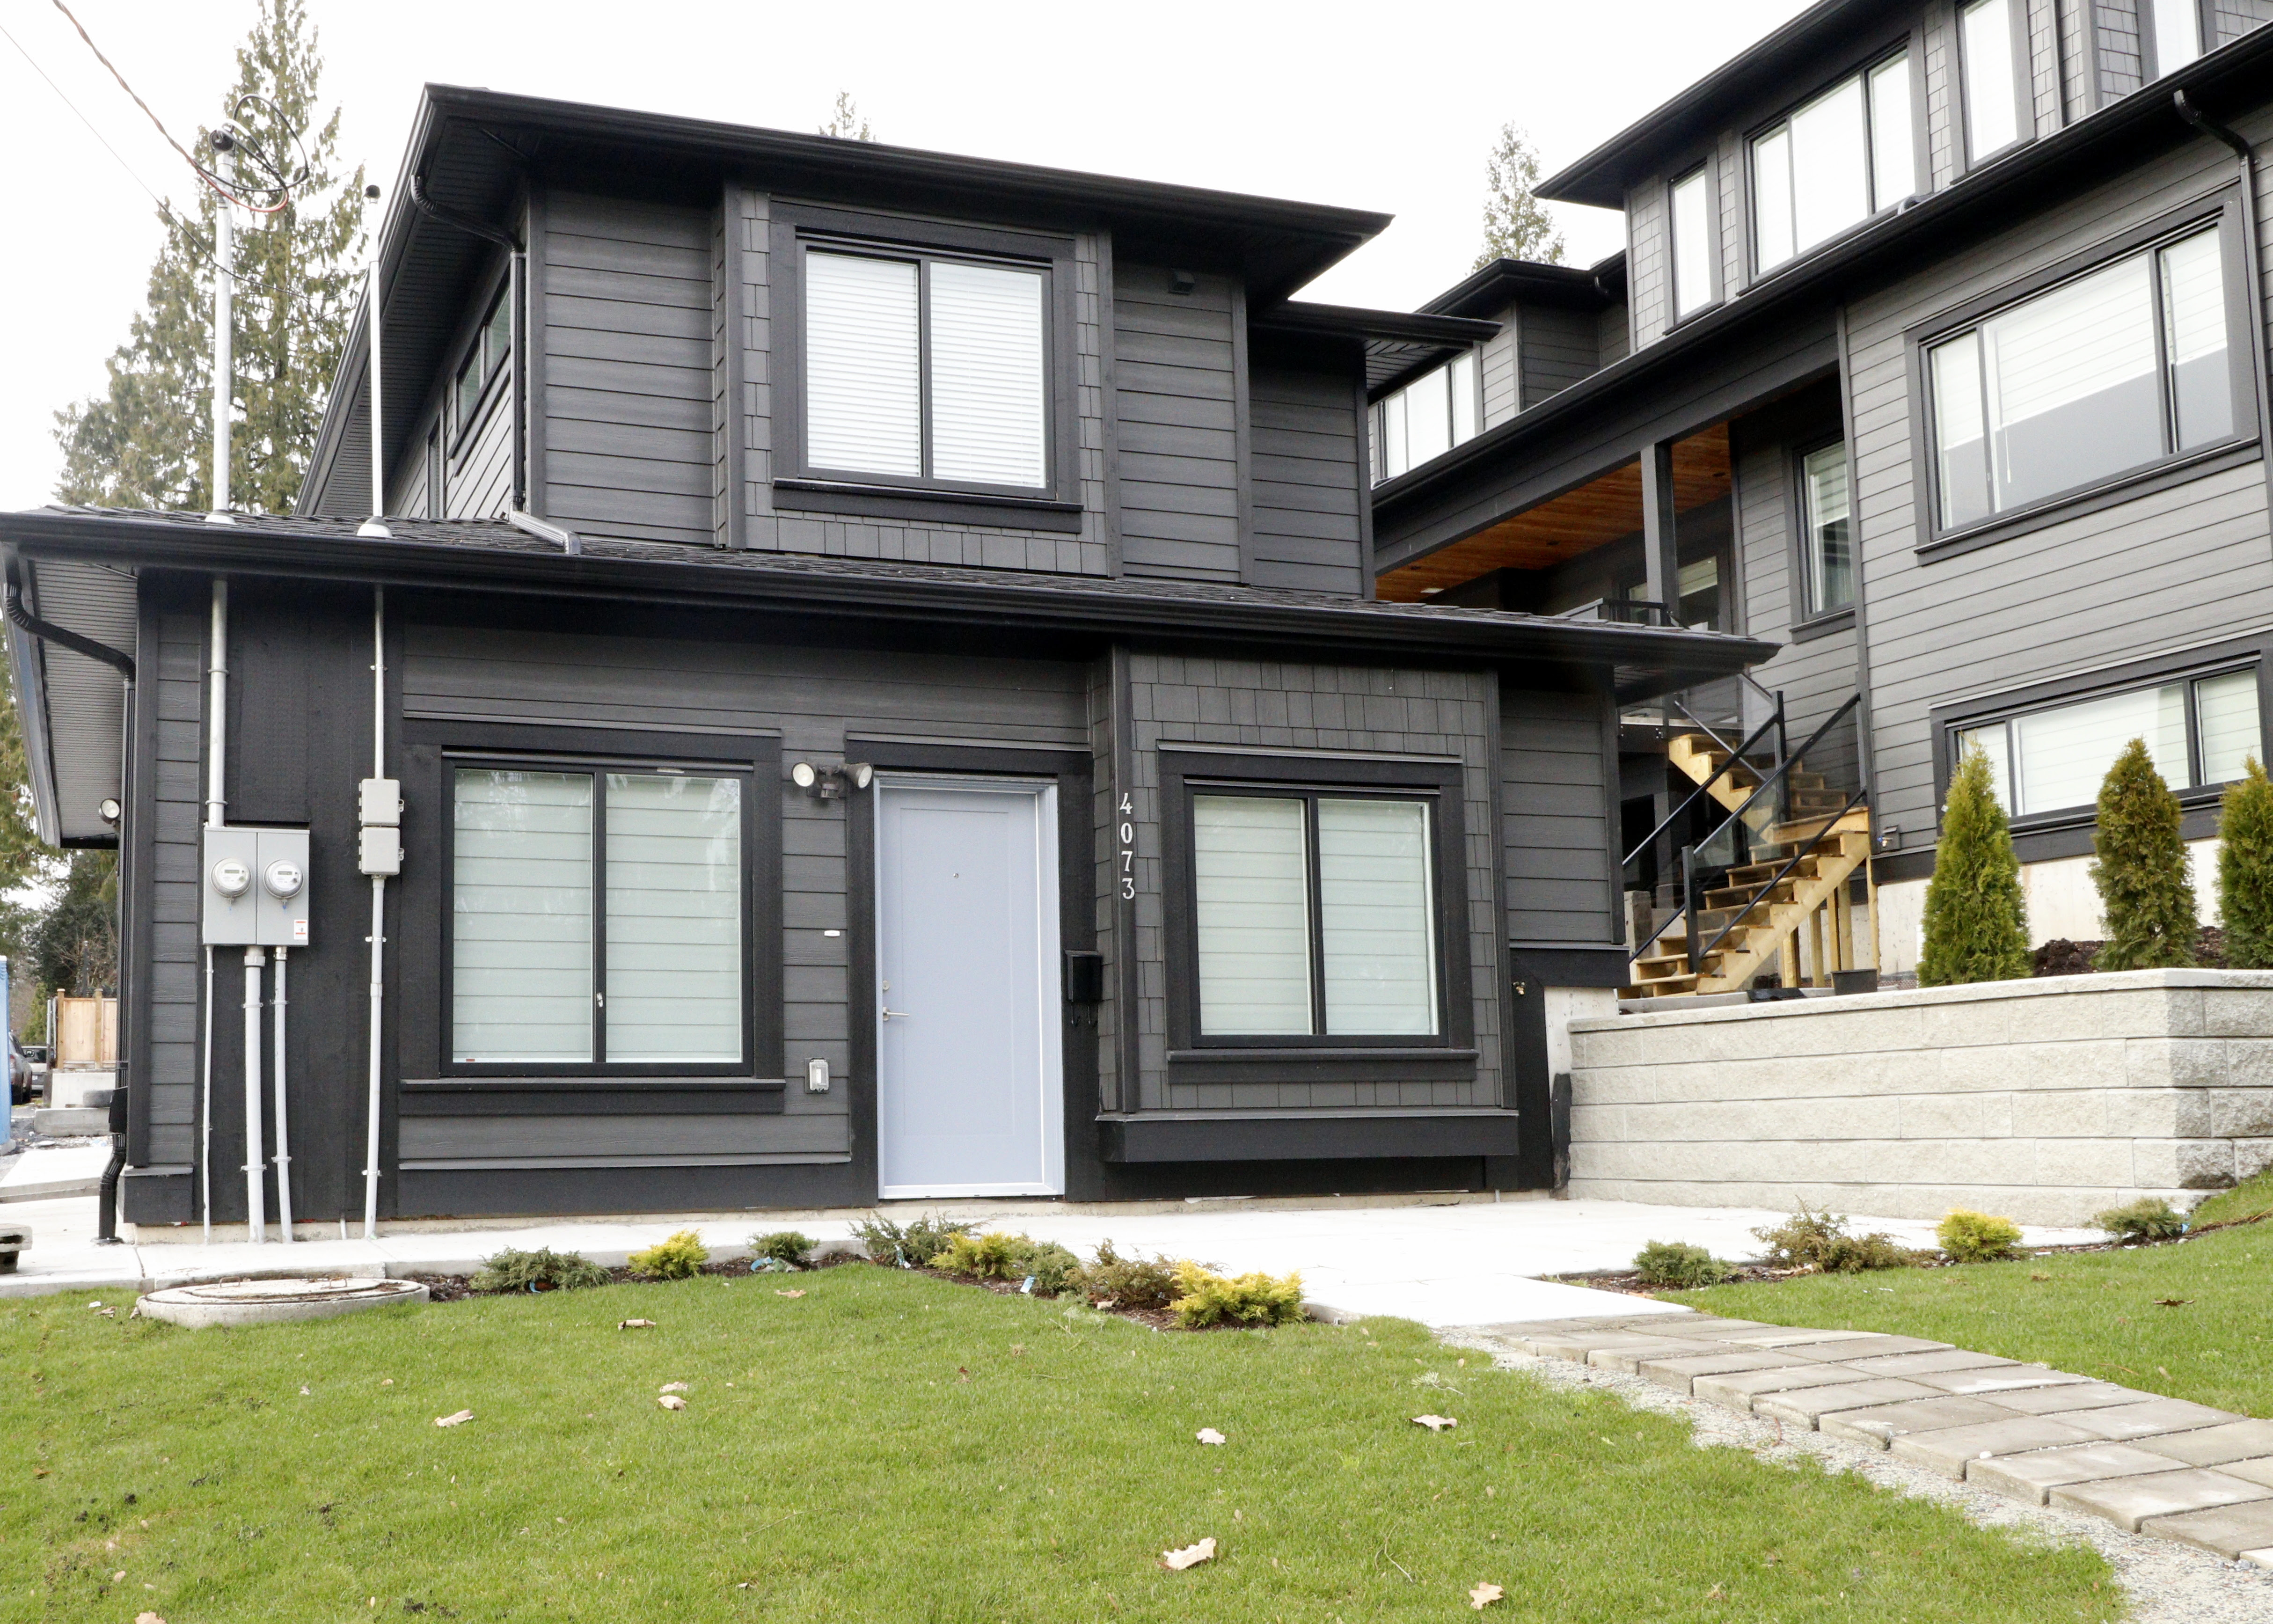 Abbotsford Apartments For Rent Craigslist